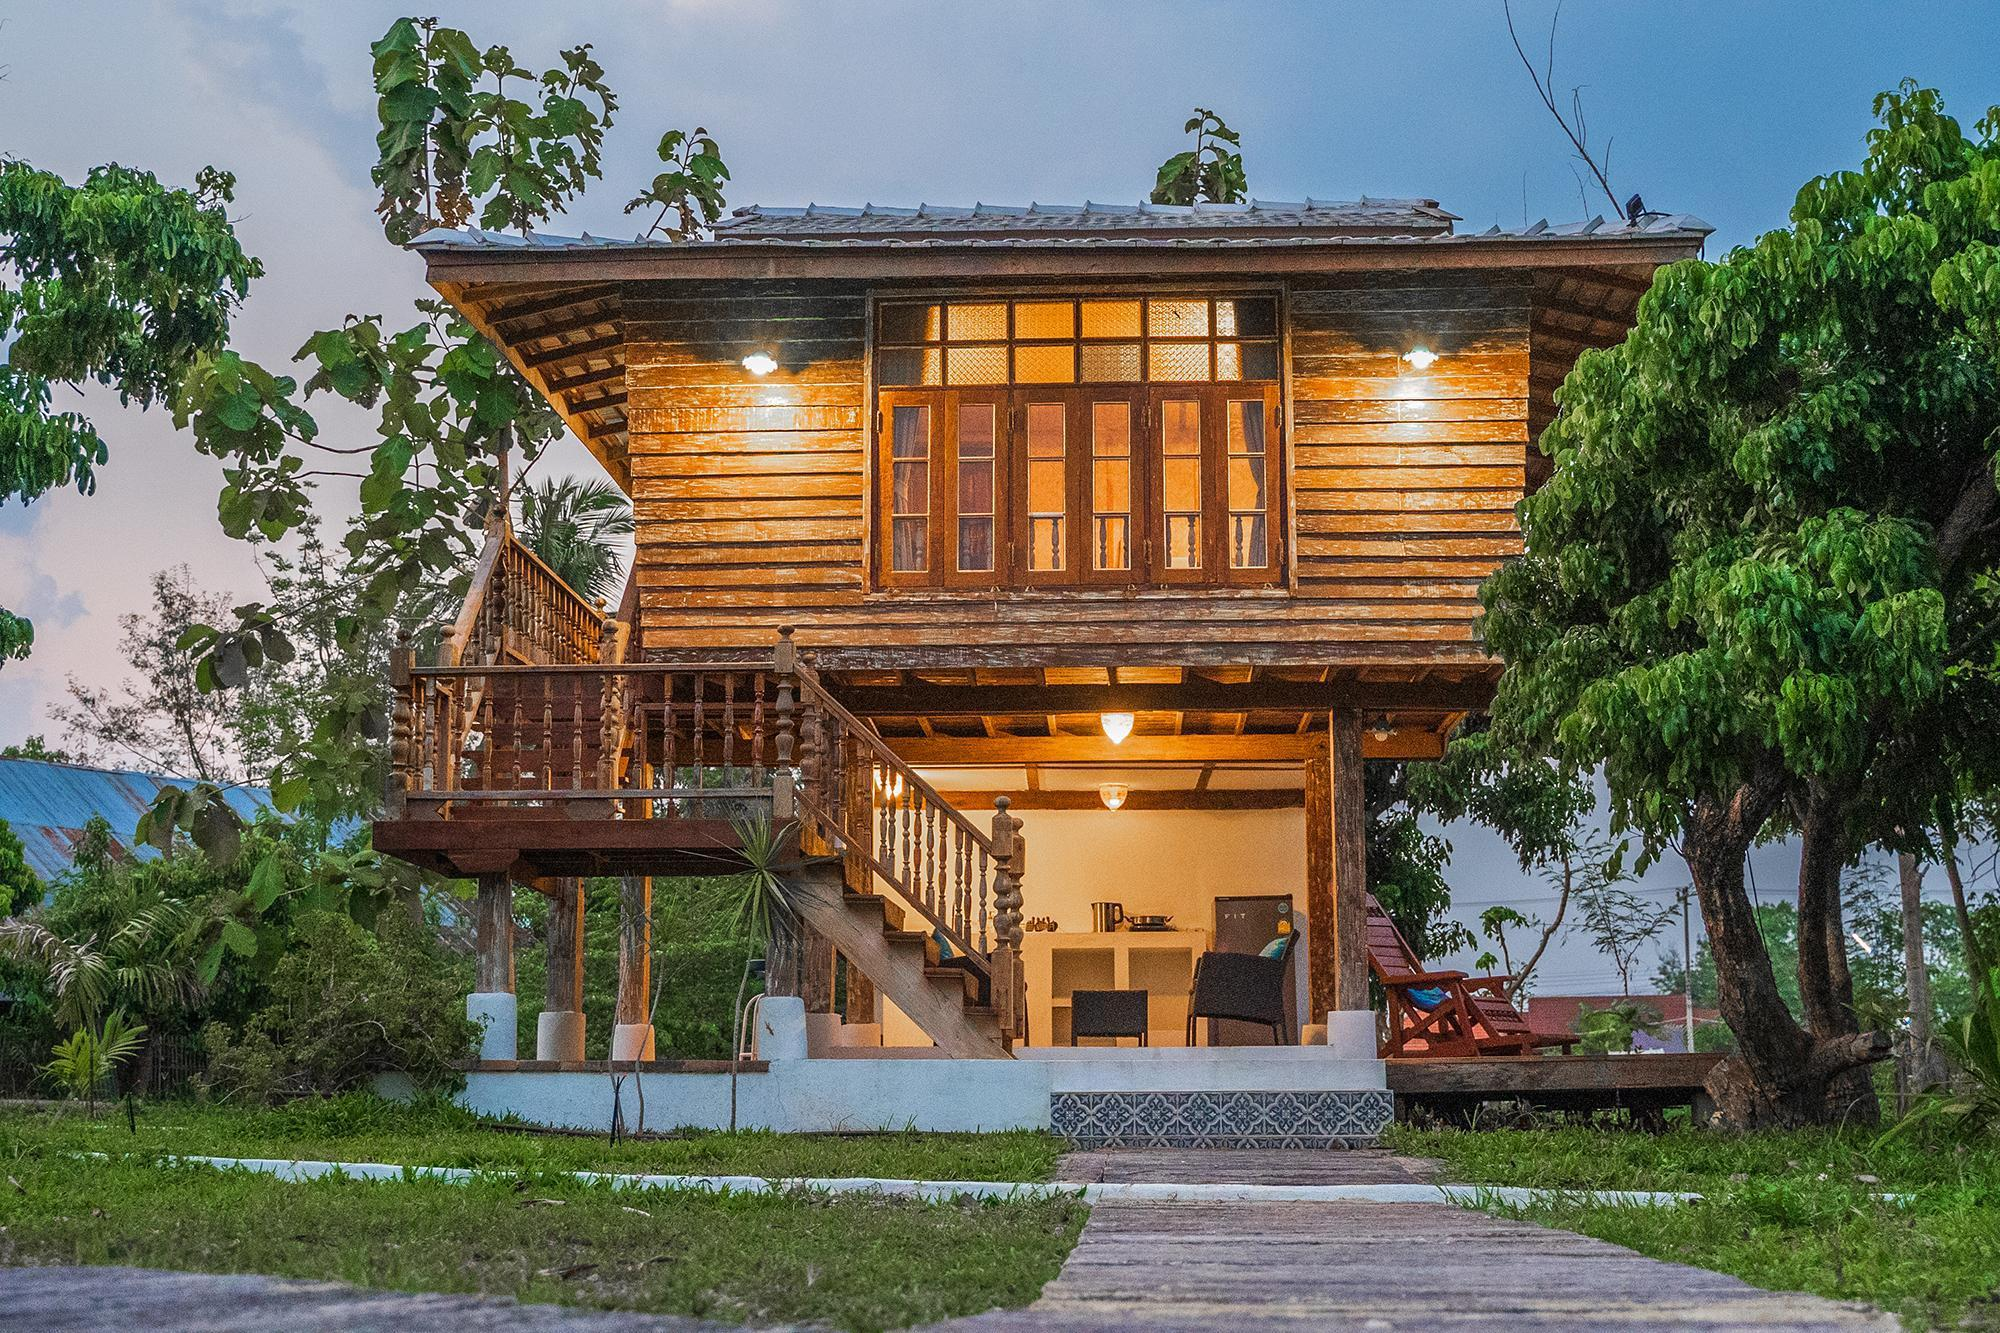 Baanchandra Jungle wooden House สตูดิโอ บ้านเดี่ยว 1 ห้องน้ำส่วนตัว ขนาด 97 ตร.ม. – หางดง